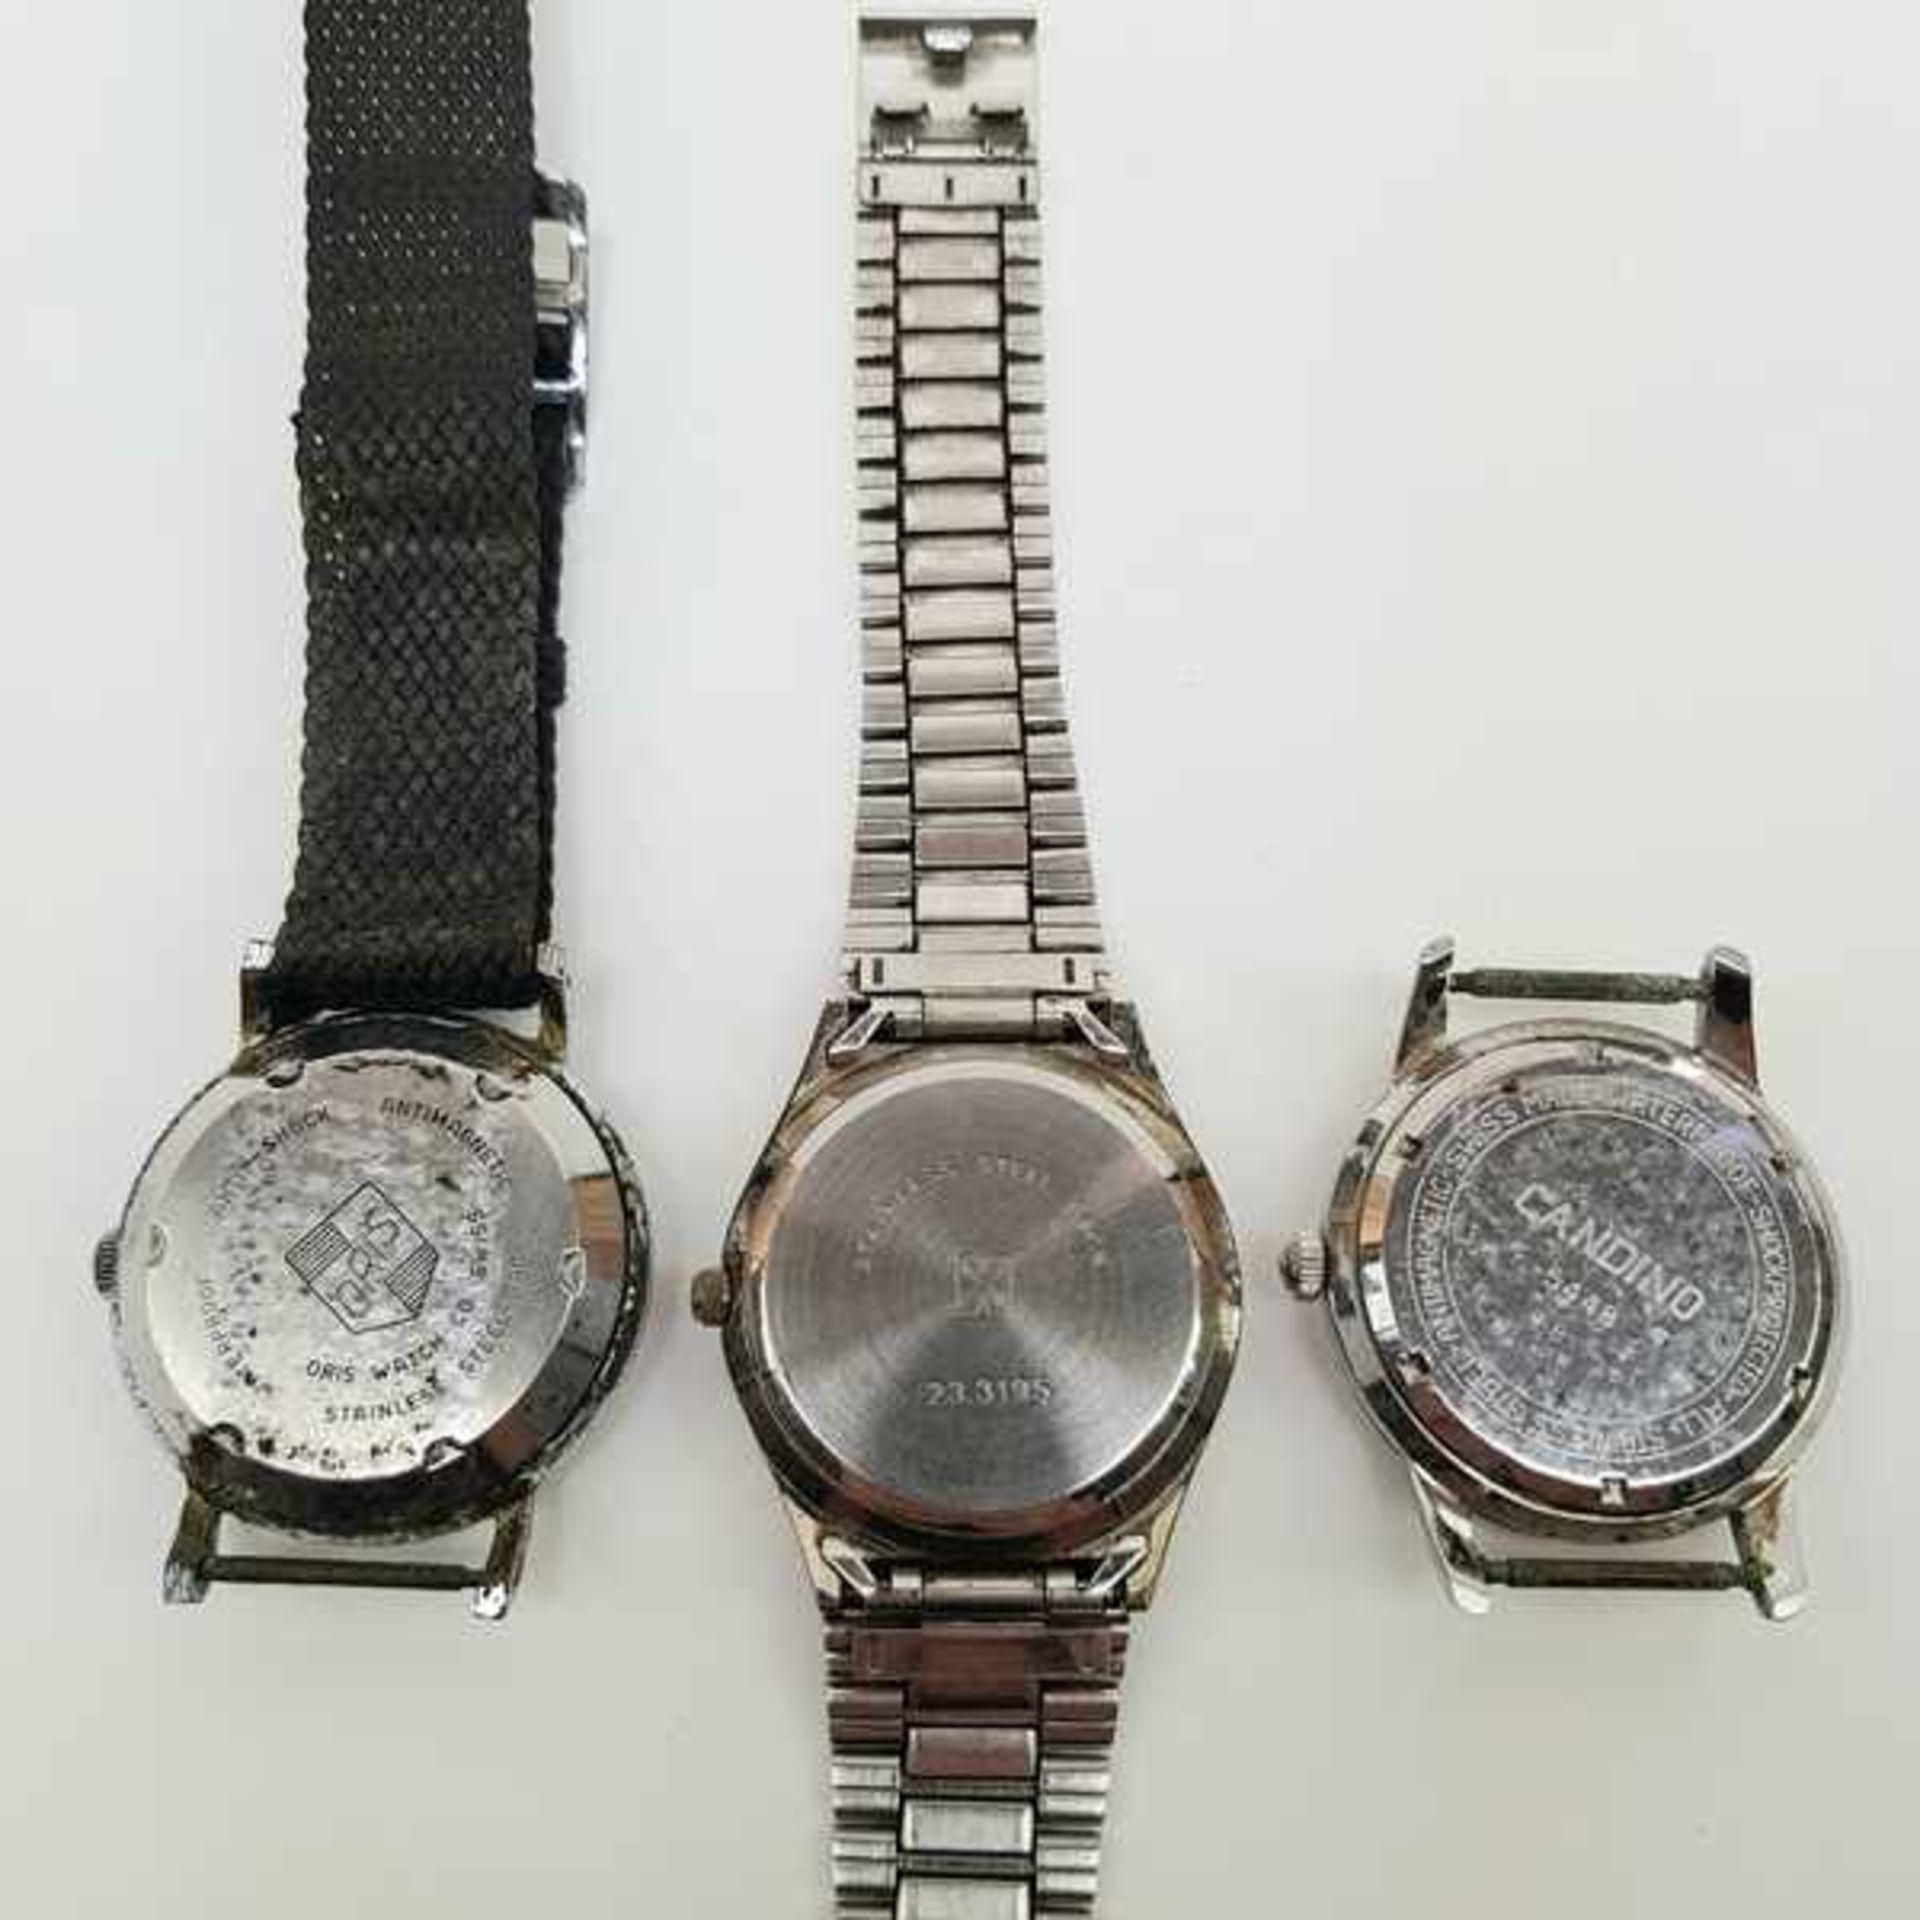 (Sieraden) Horloges Oris - Image 2 of 3